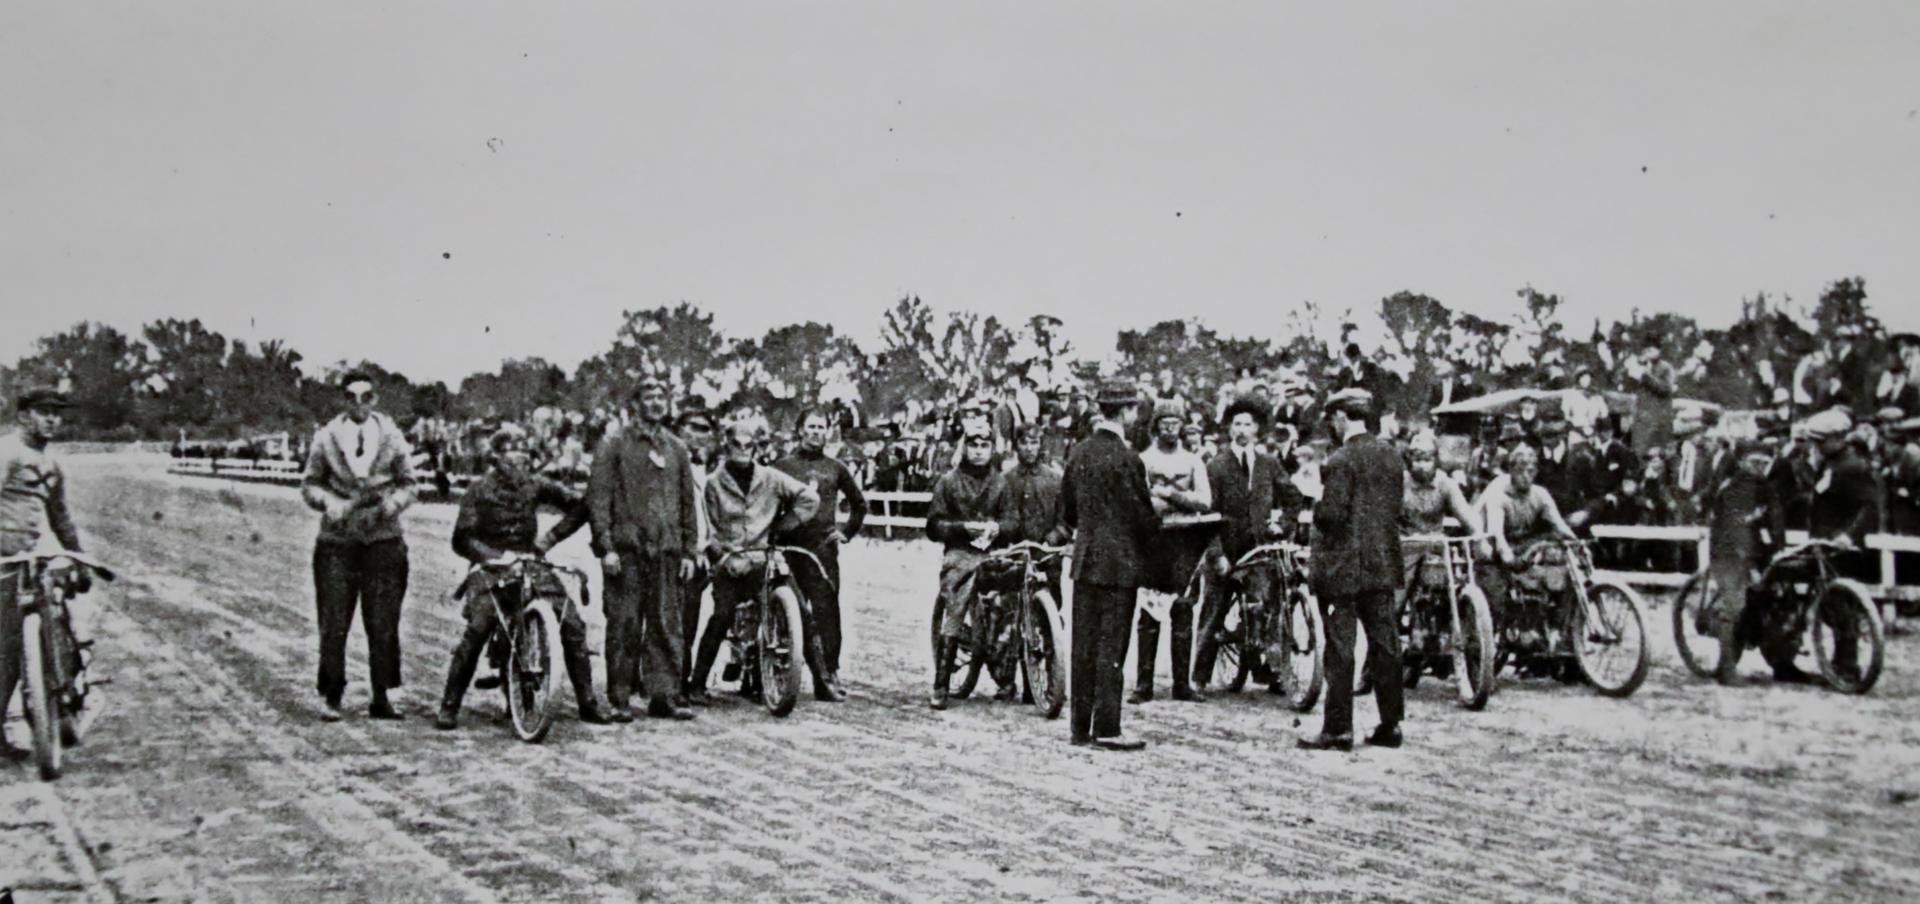 1912 eller 1913 (2).JPG